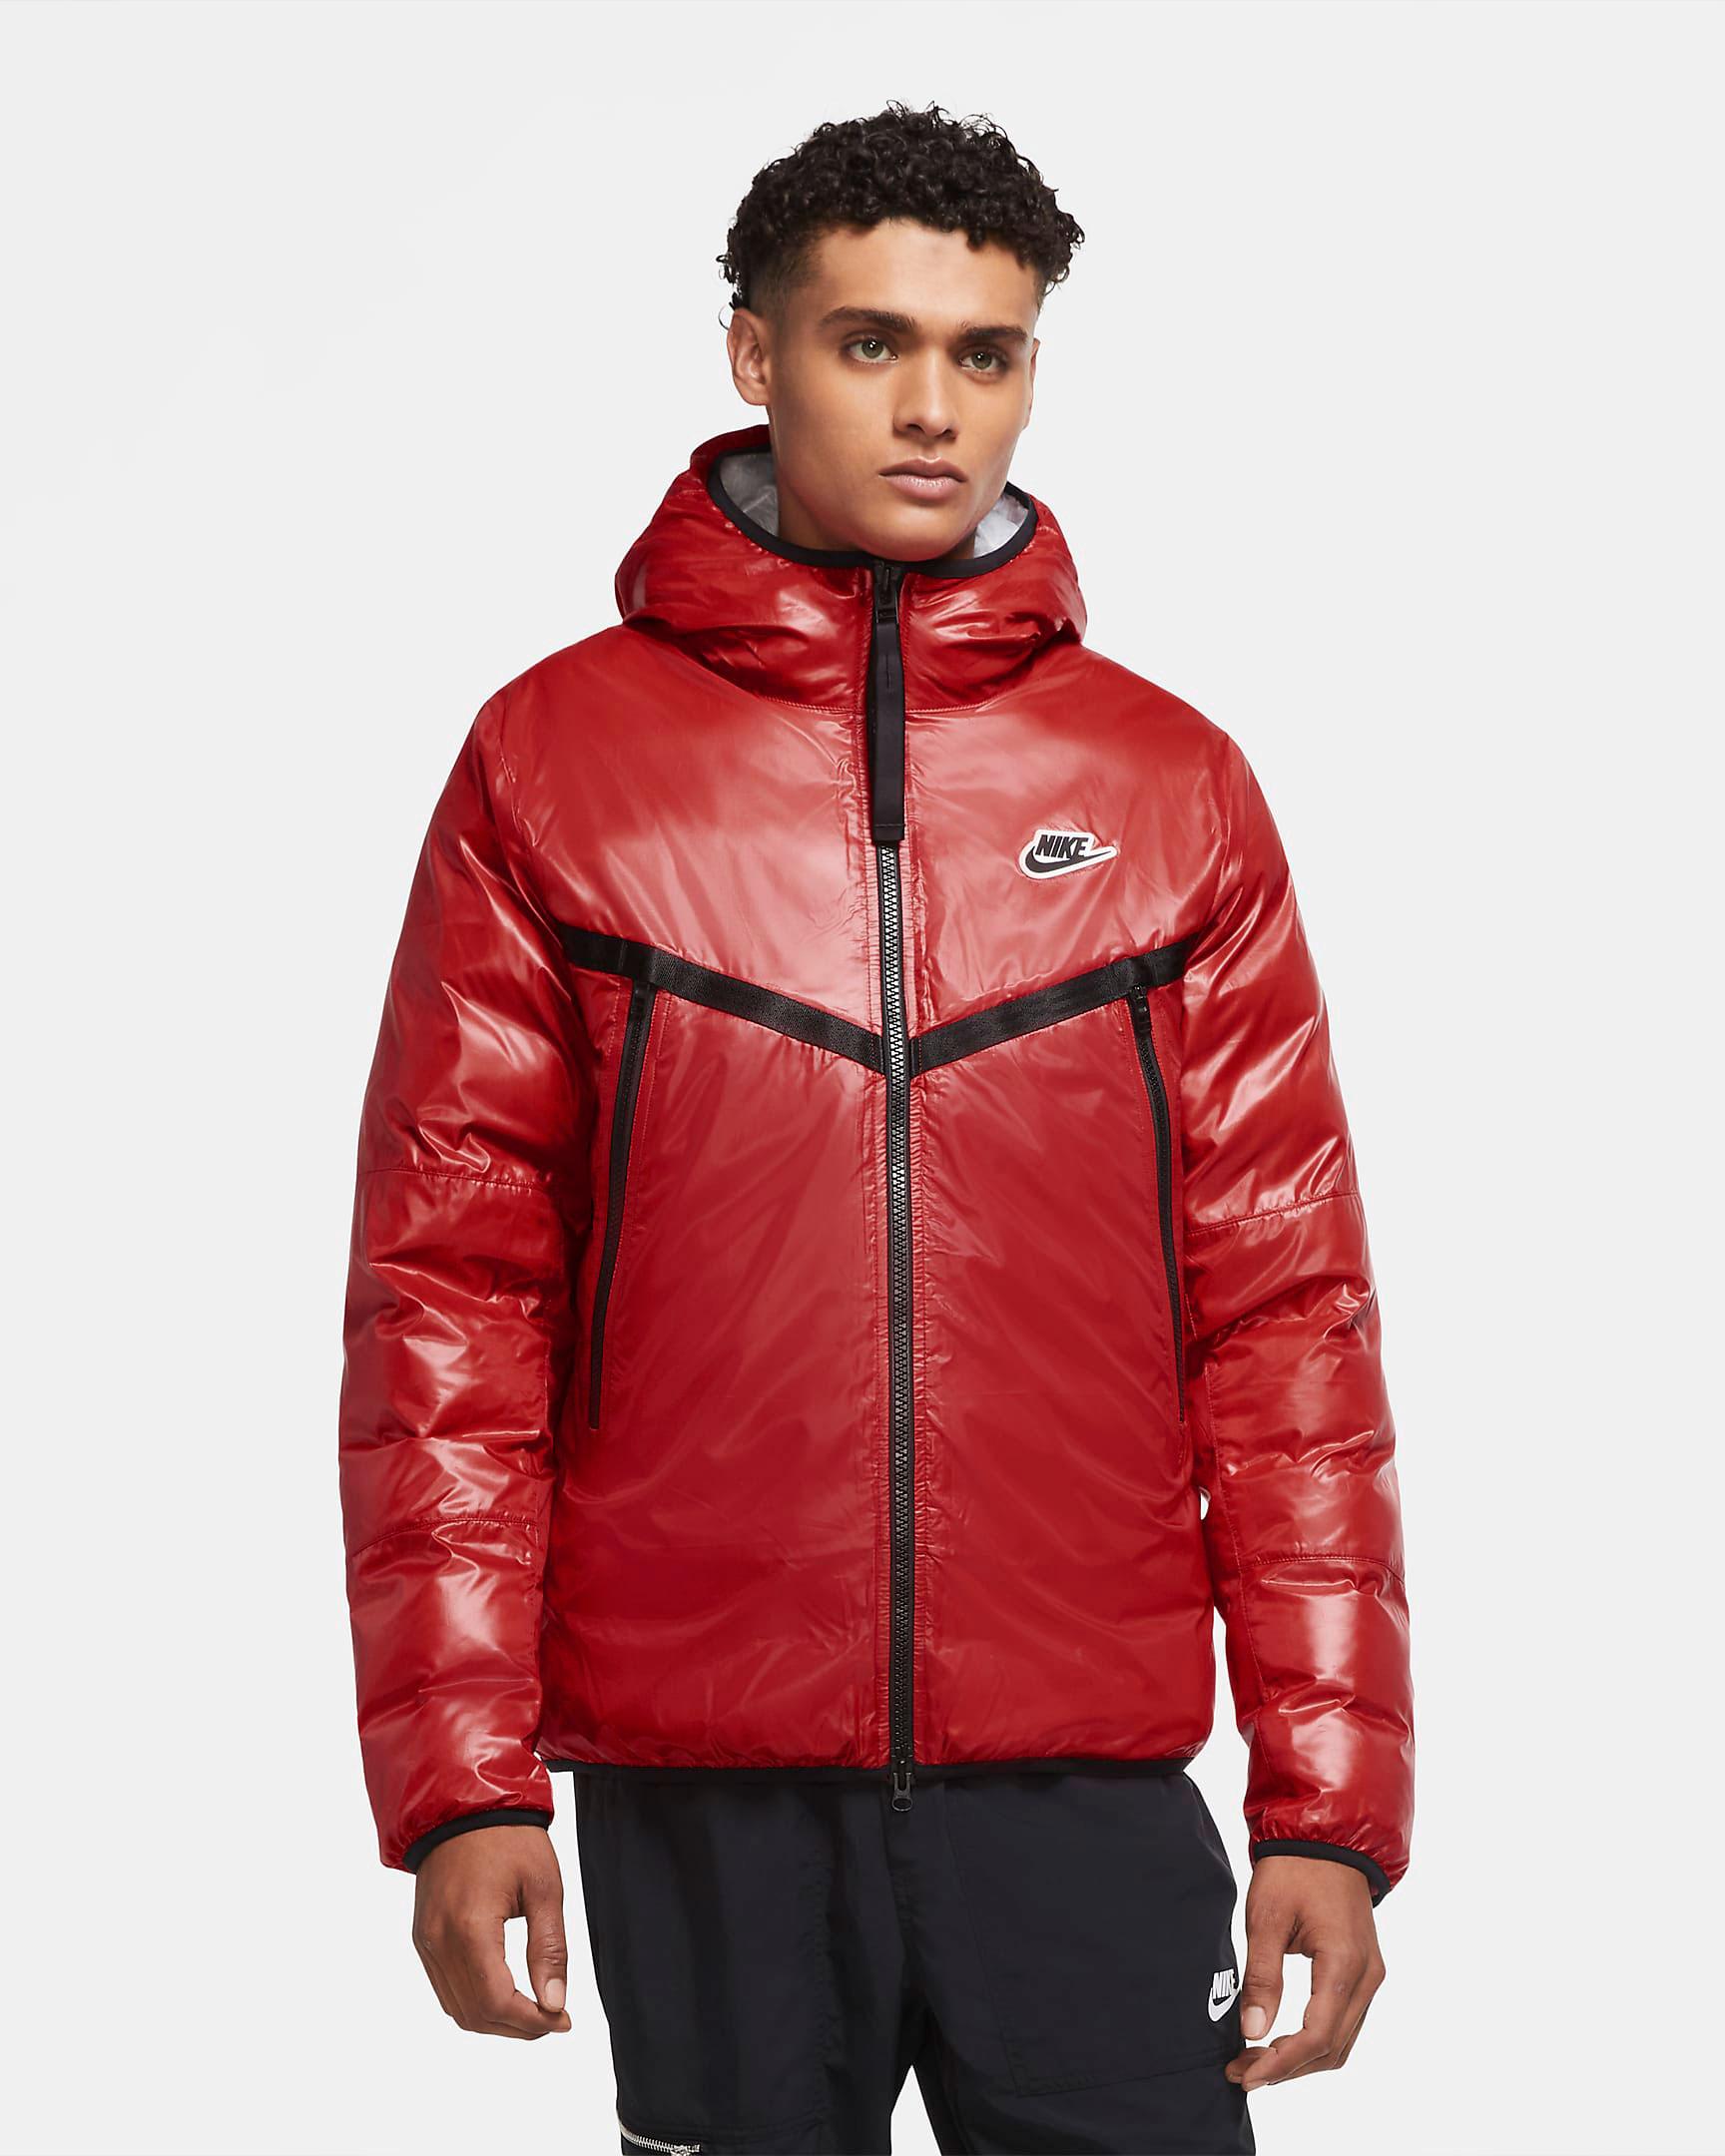 air-jordan-4-fire-red-nike-air-winter-jacket